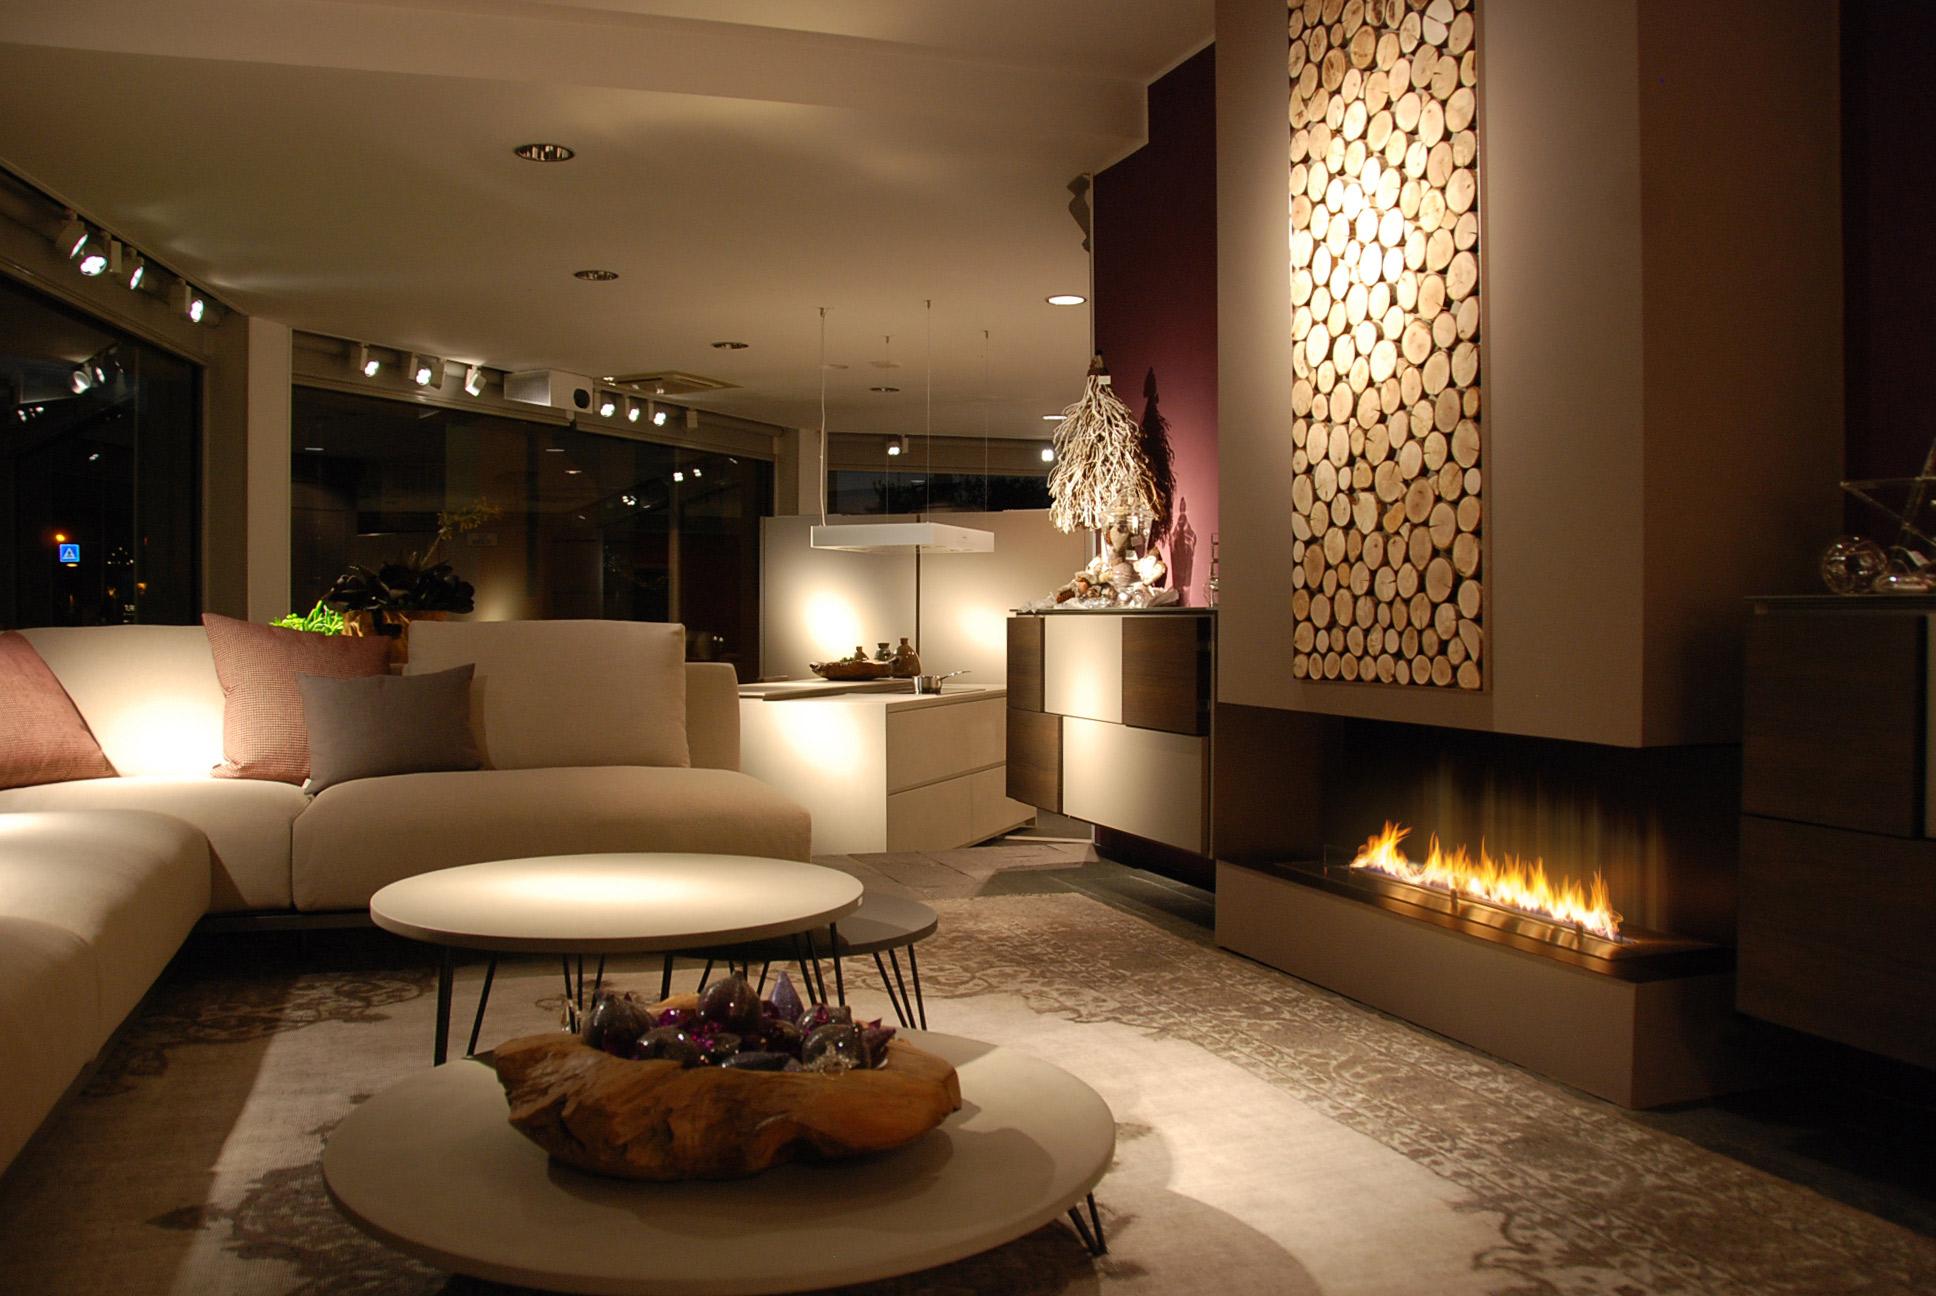 Fire-Line-Automatic-3-PlanikaTurra-Arredamenti-Showroom-Iseo-Italy-photo-Turra-Arredamenti_3.jpg